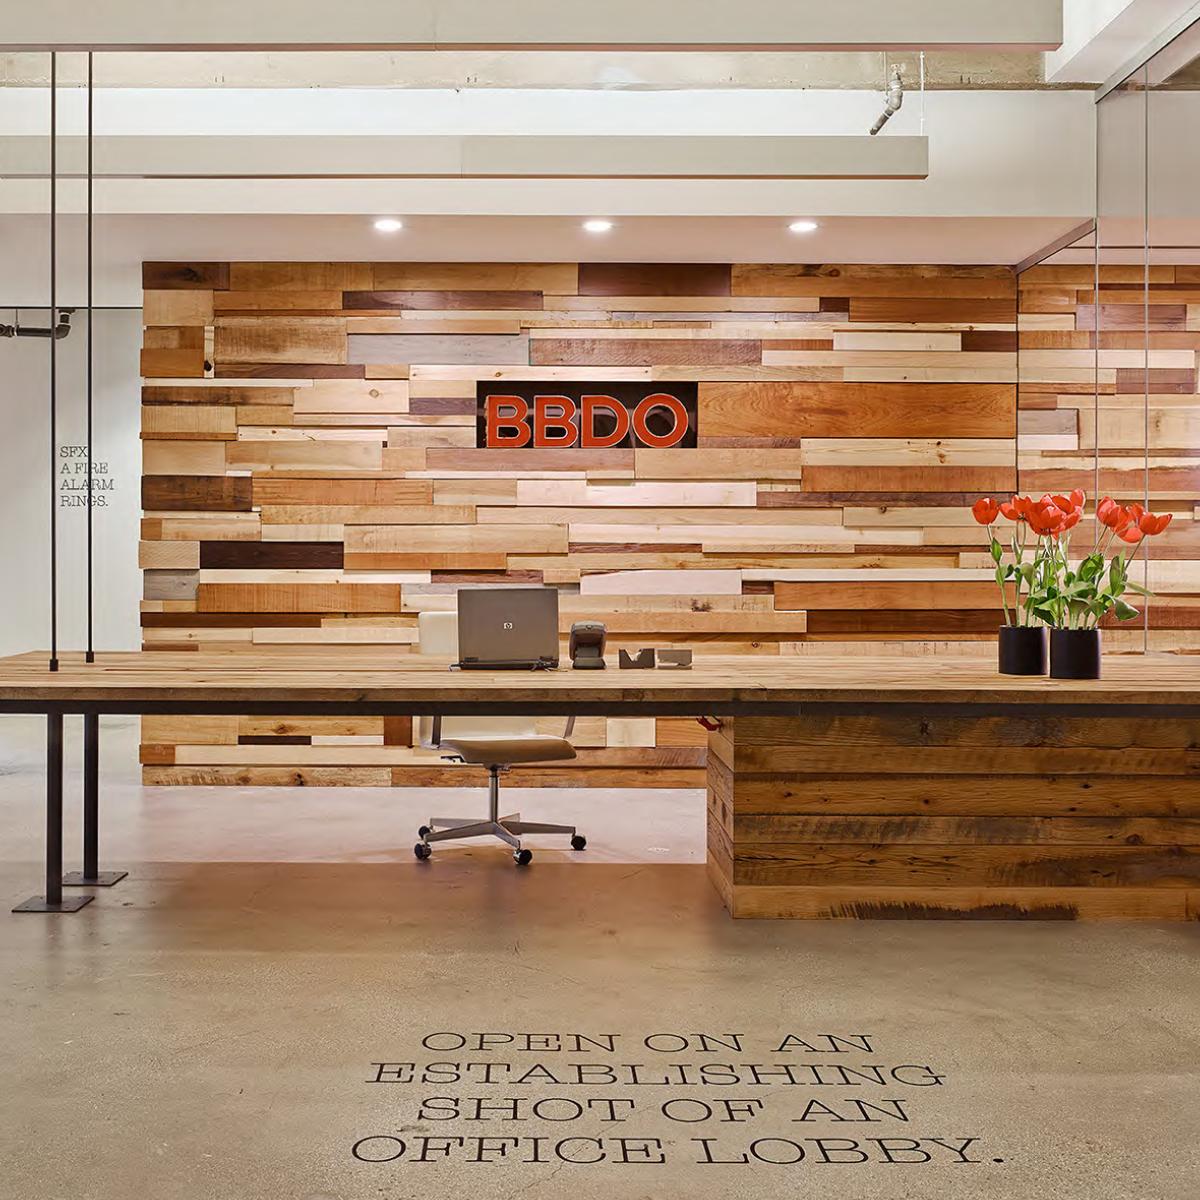 bbdo-new-york-offices-bureaux-agence-publicite-4